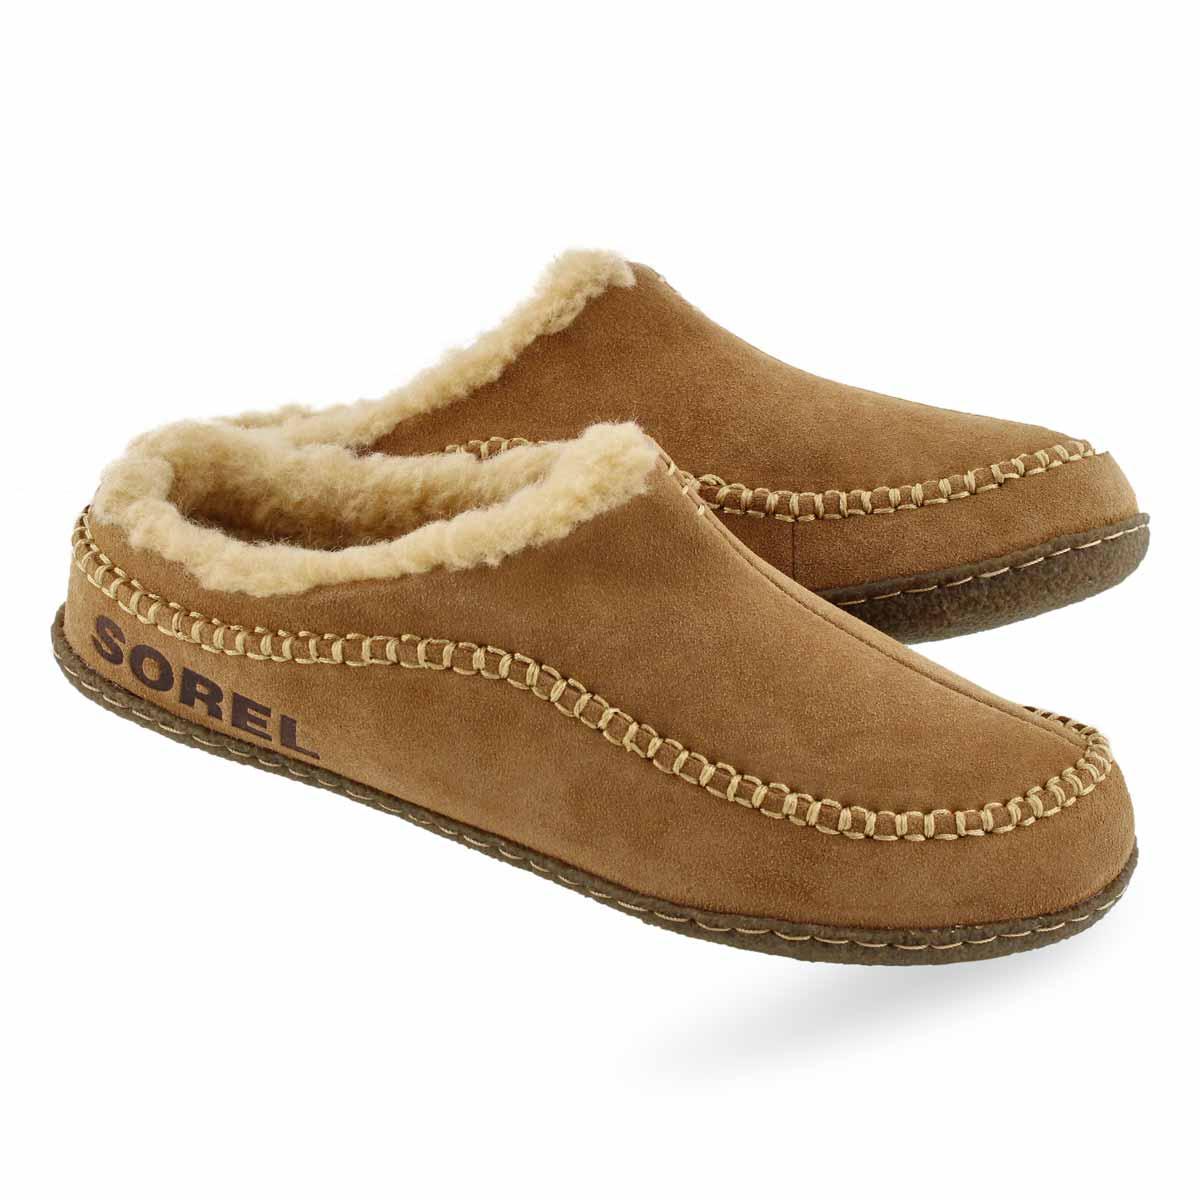 Men's Falcon Ridge II Slipper - Camel/Brown/Curry